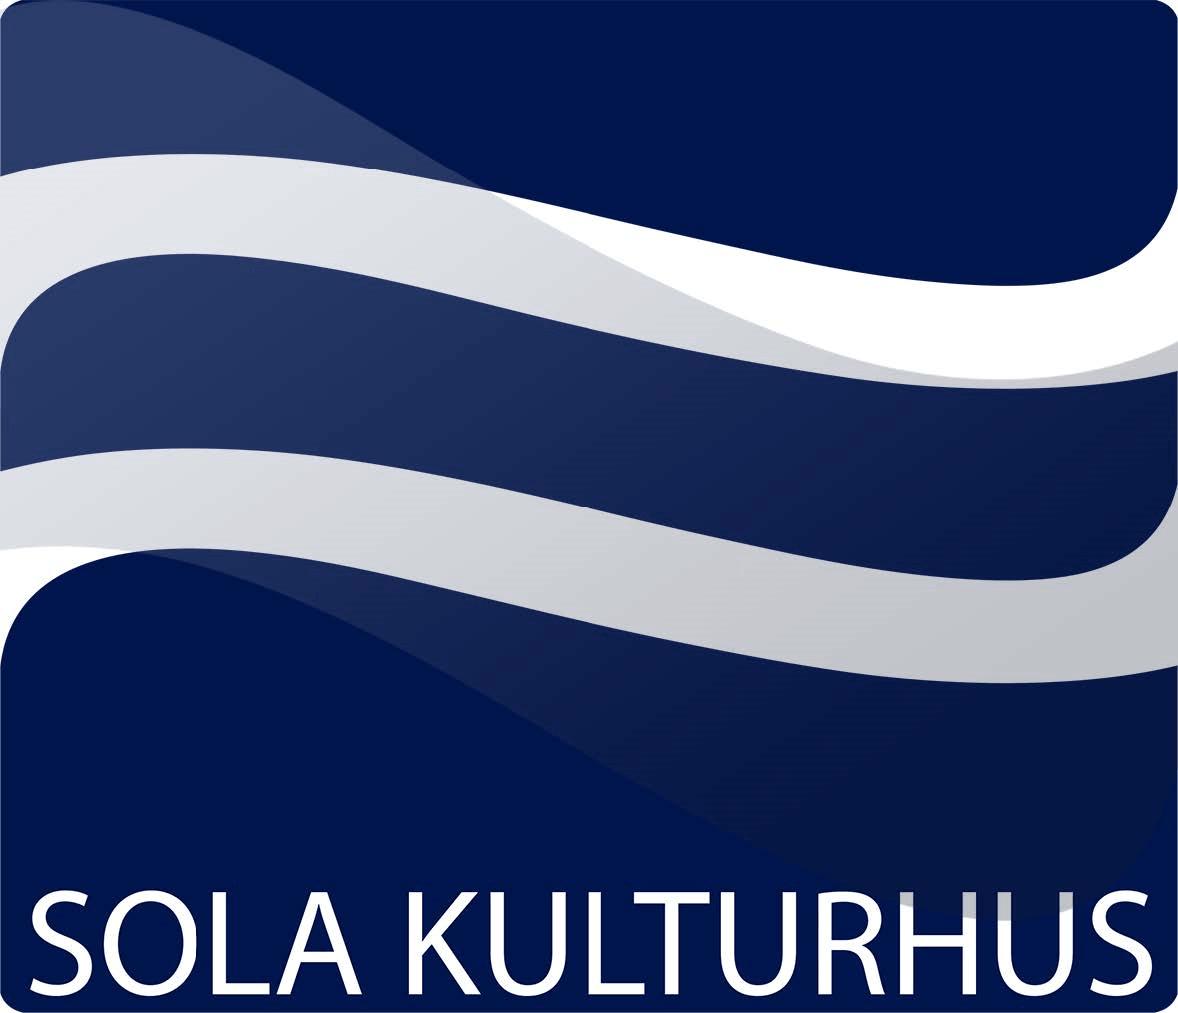 logo Sola kulturhus